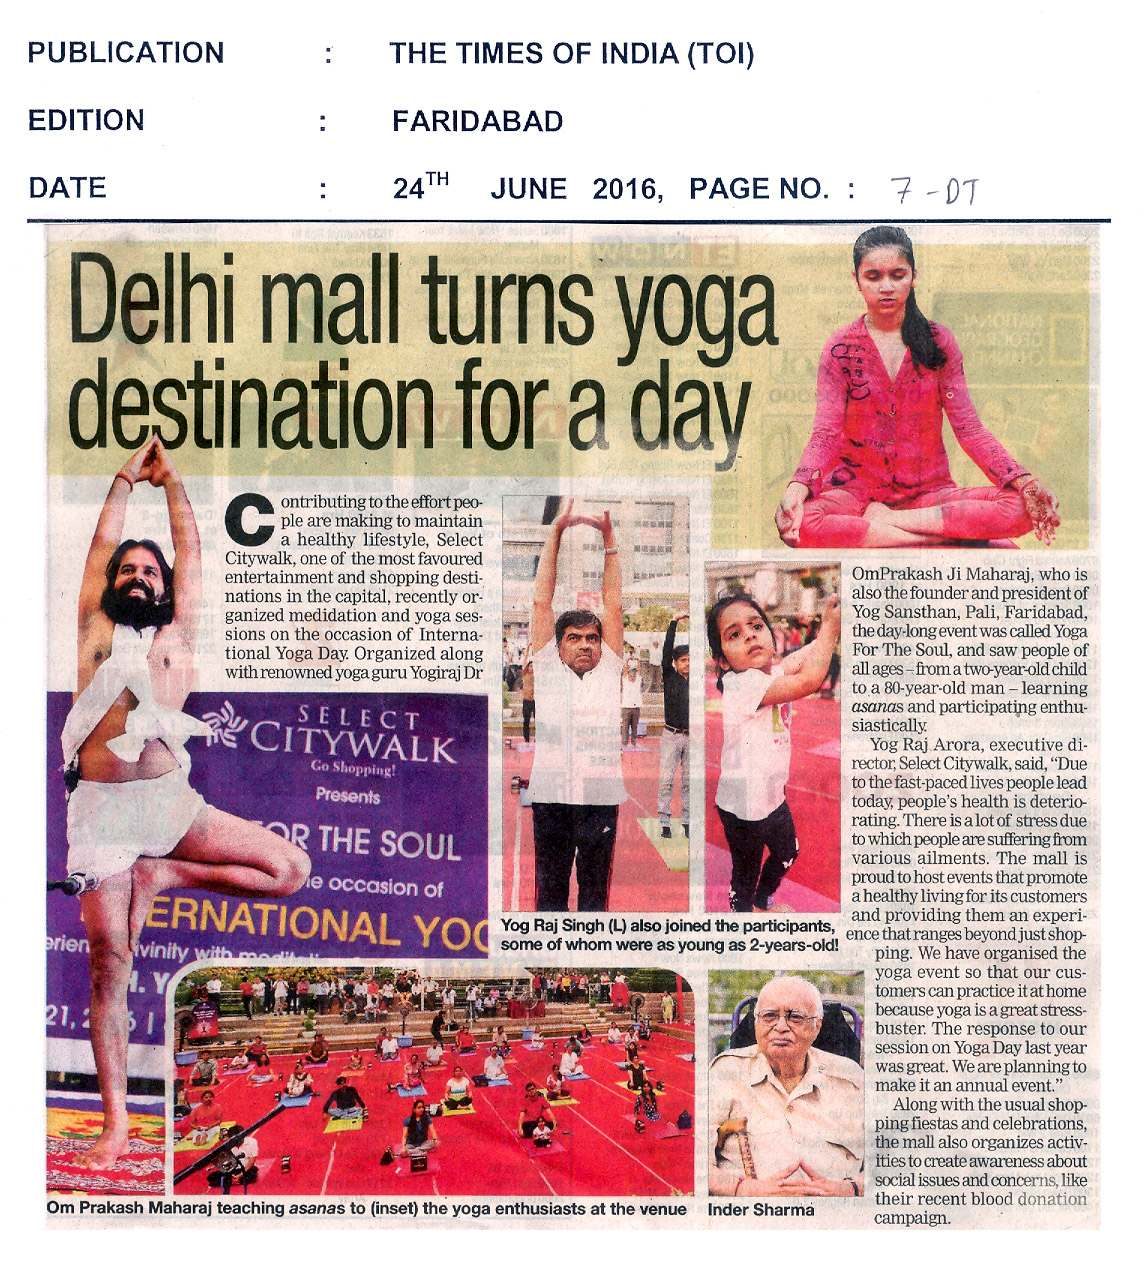 Delhi mall turns yoga destination for a day